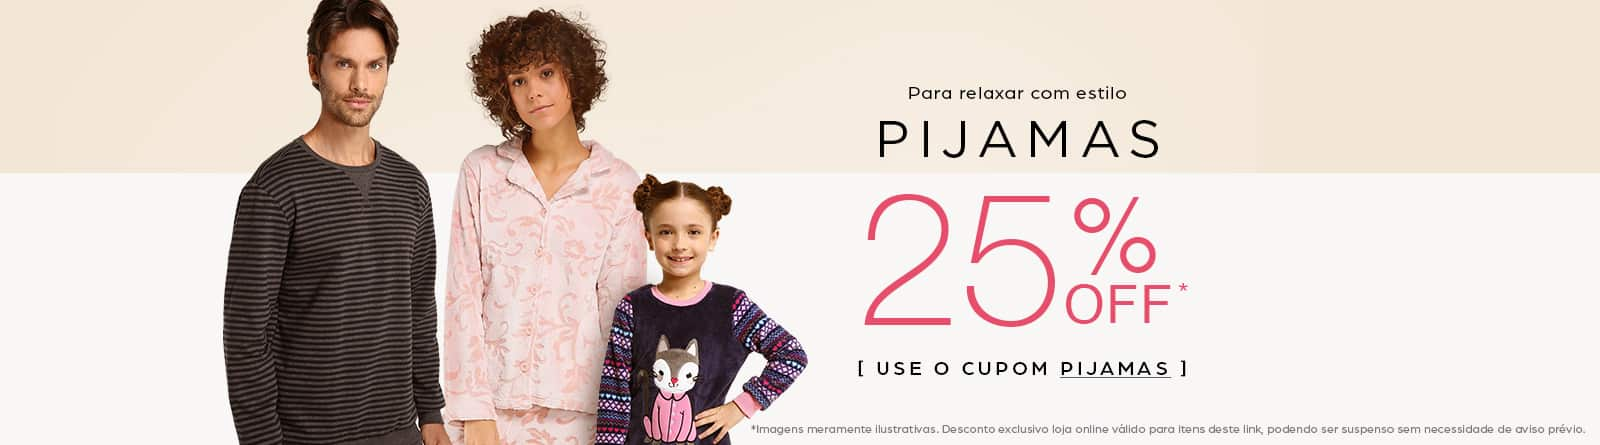 Pijamas 25% OFF com cupom